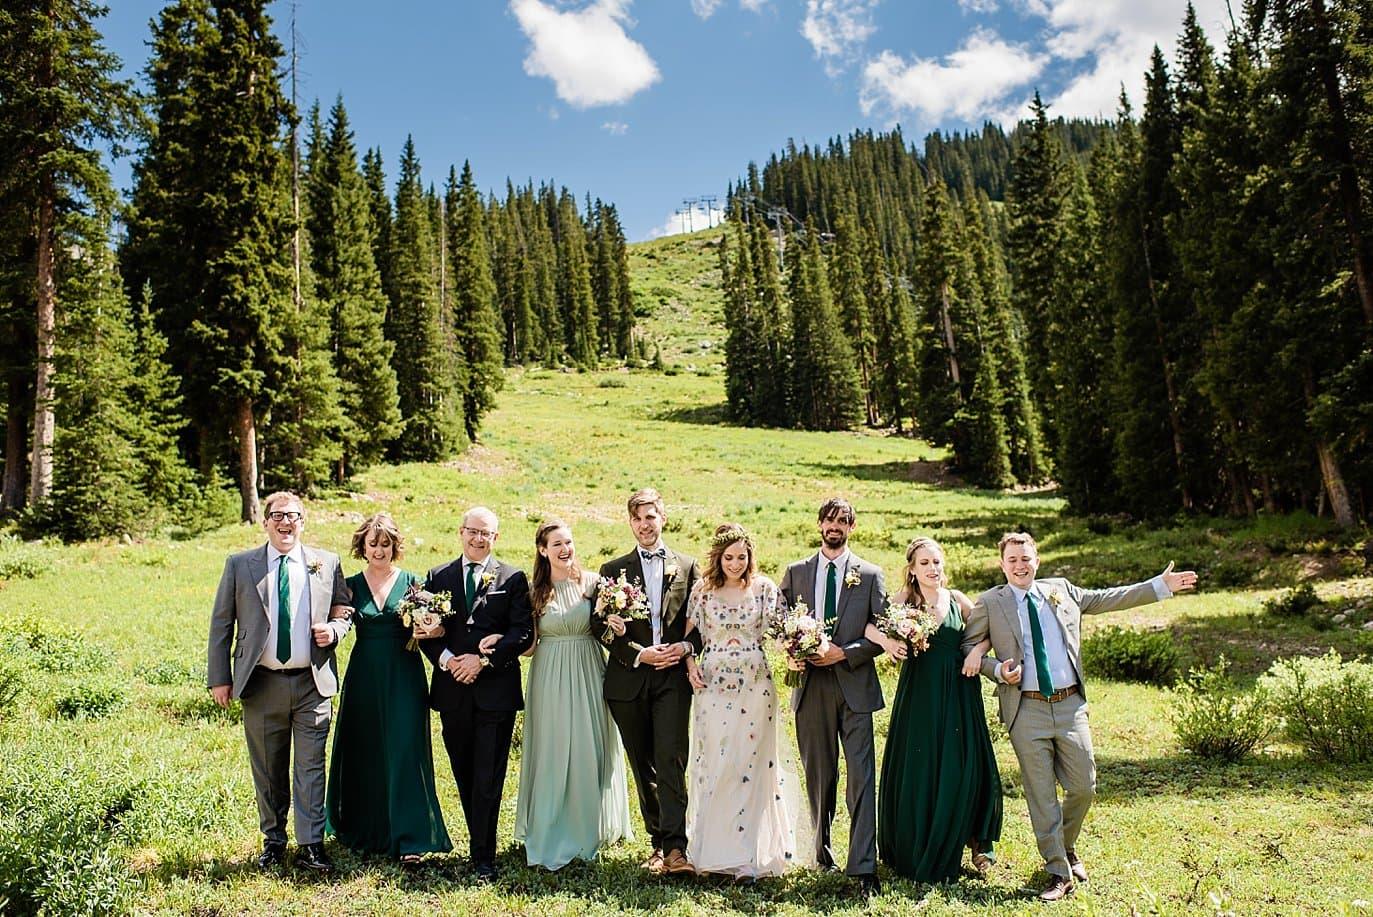 bridal party on slopes of mountain at Arapahoe Basin wedding by Arapahoe Basin wedding photographer Jennie Crate photographer